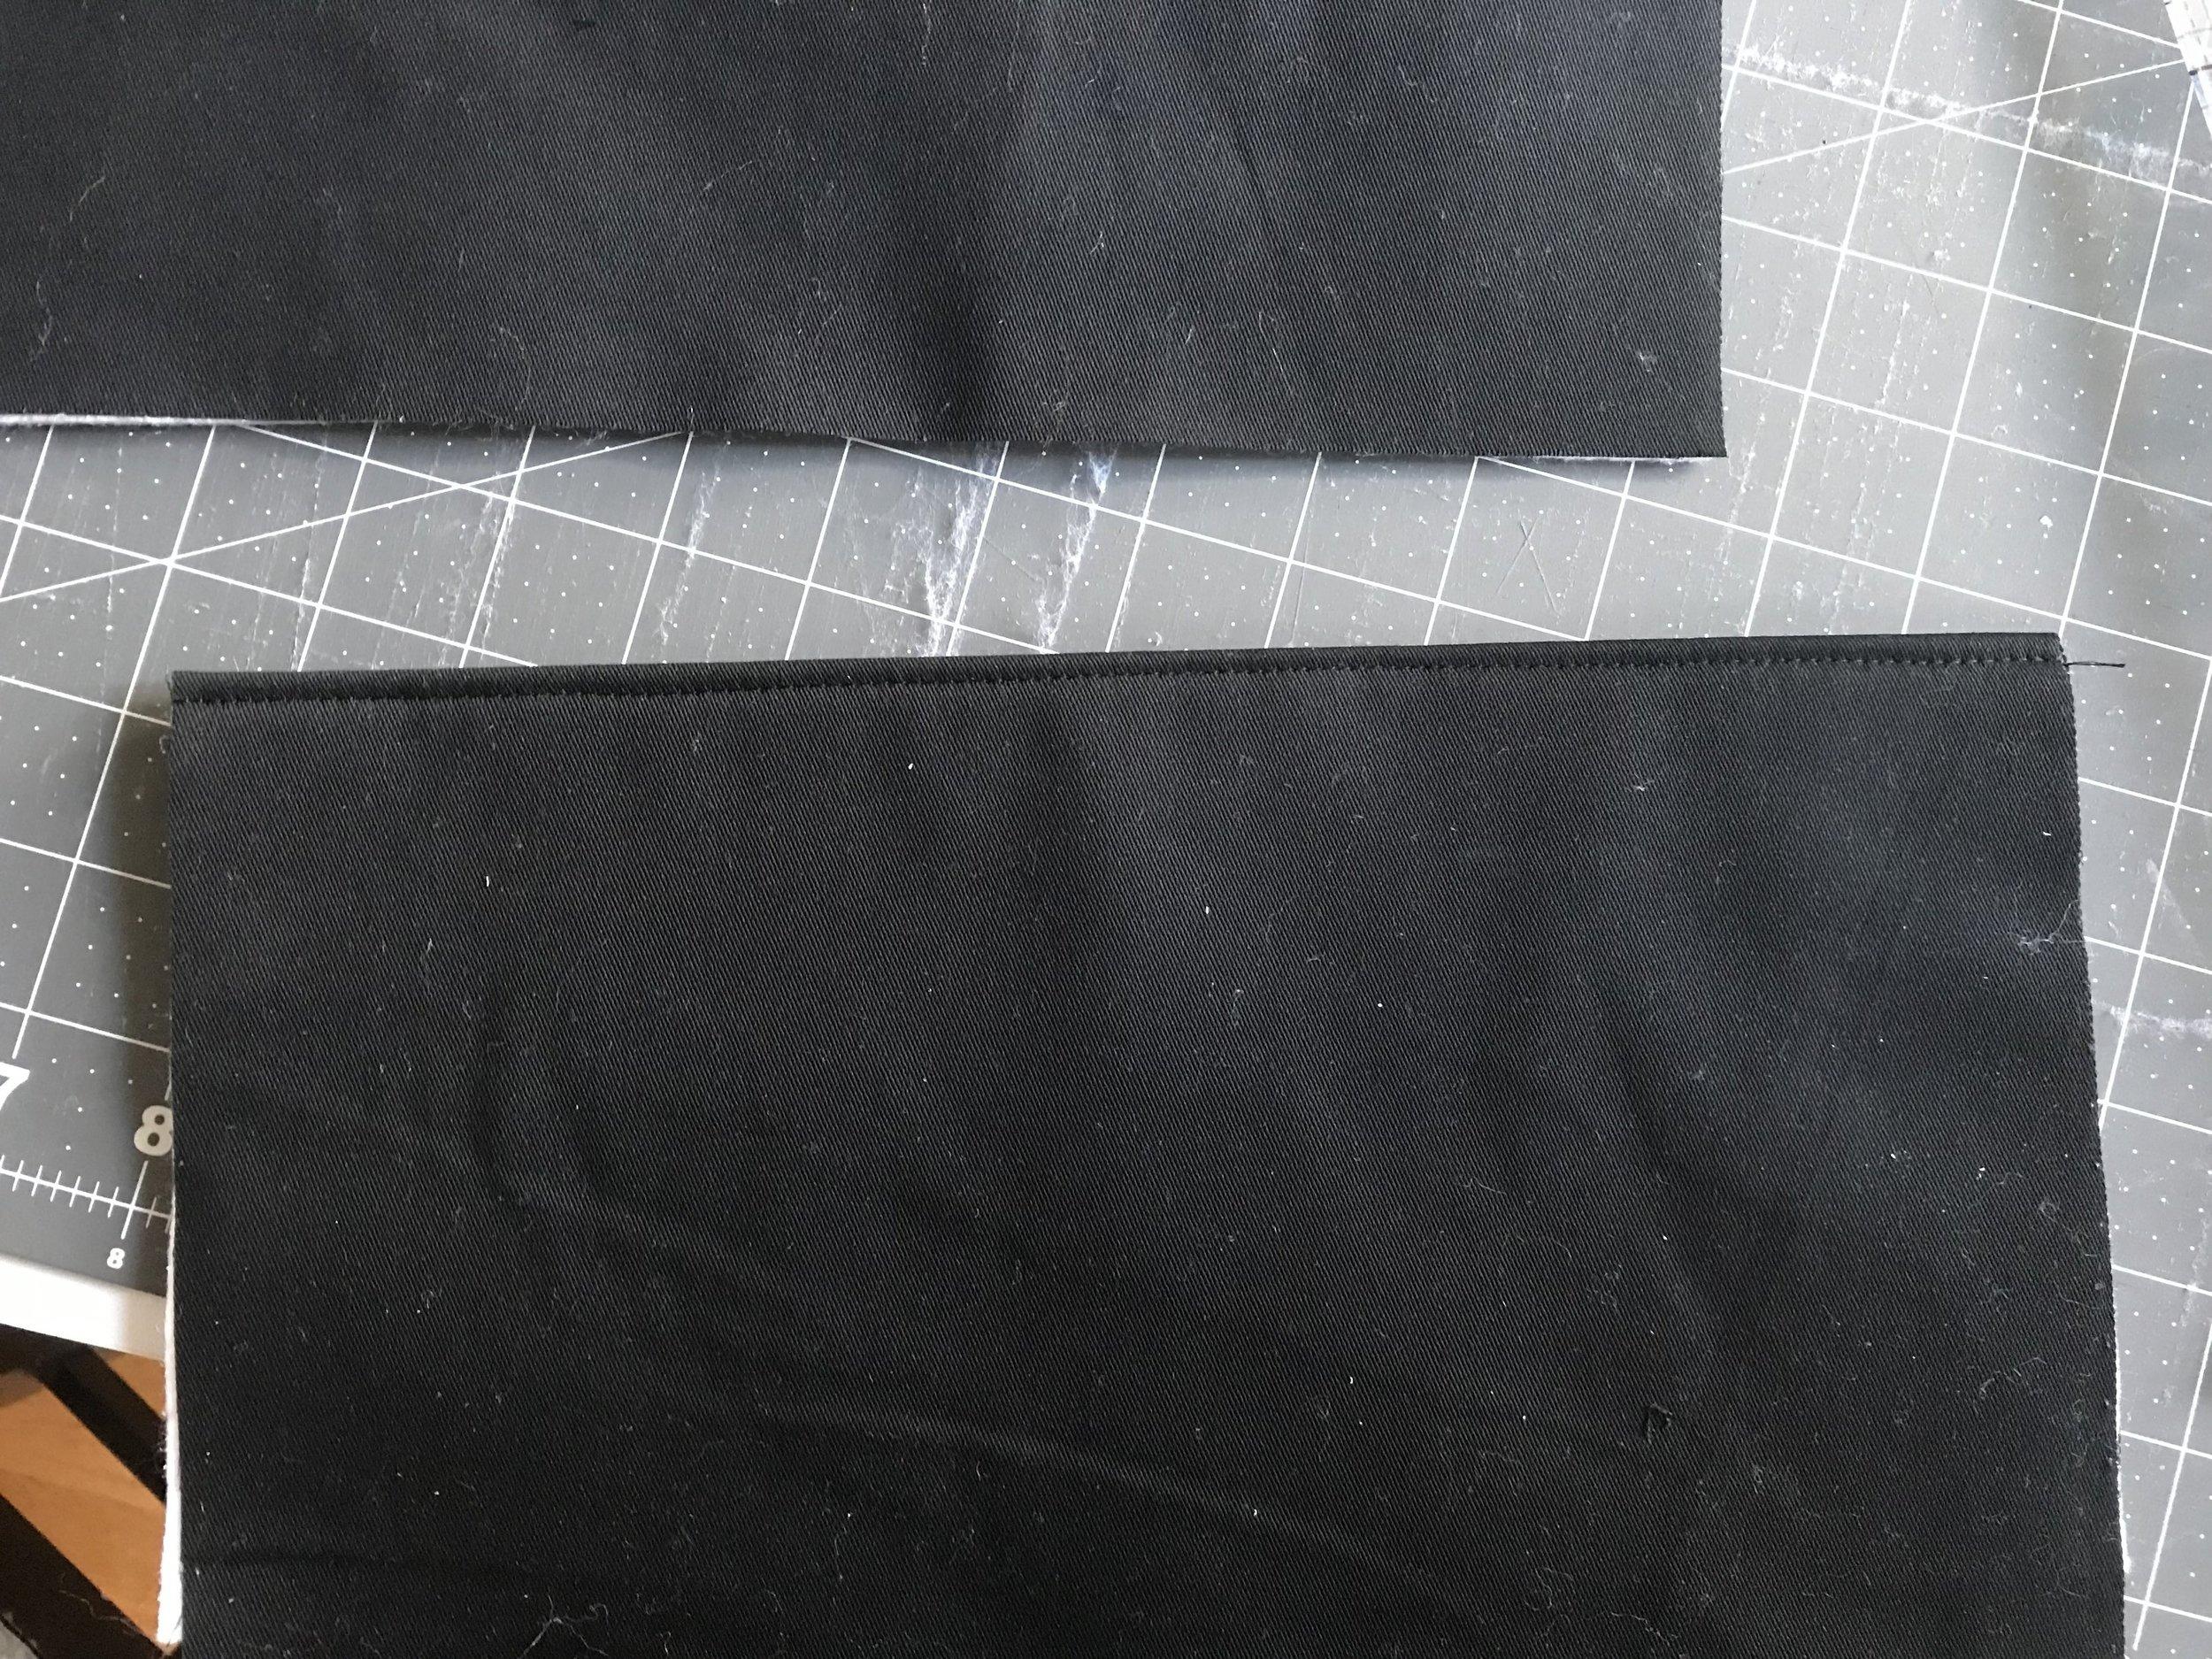 vendor's apron